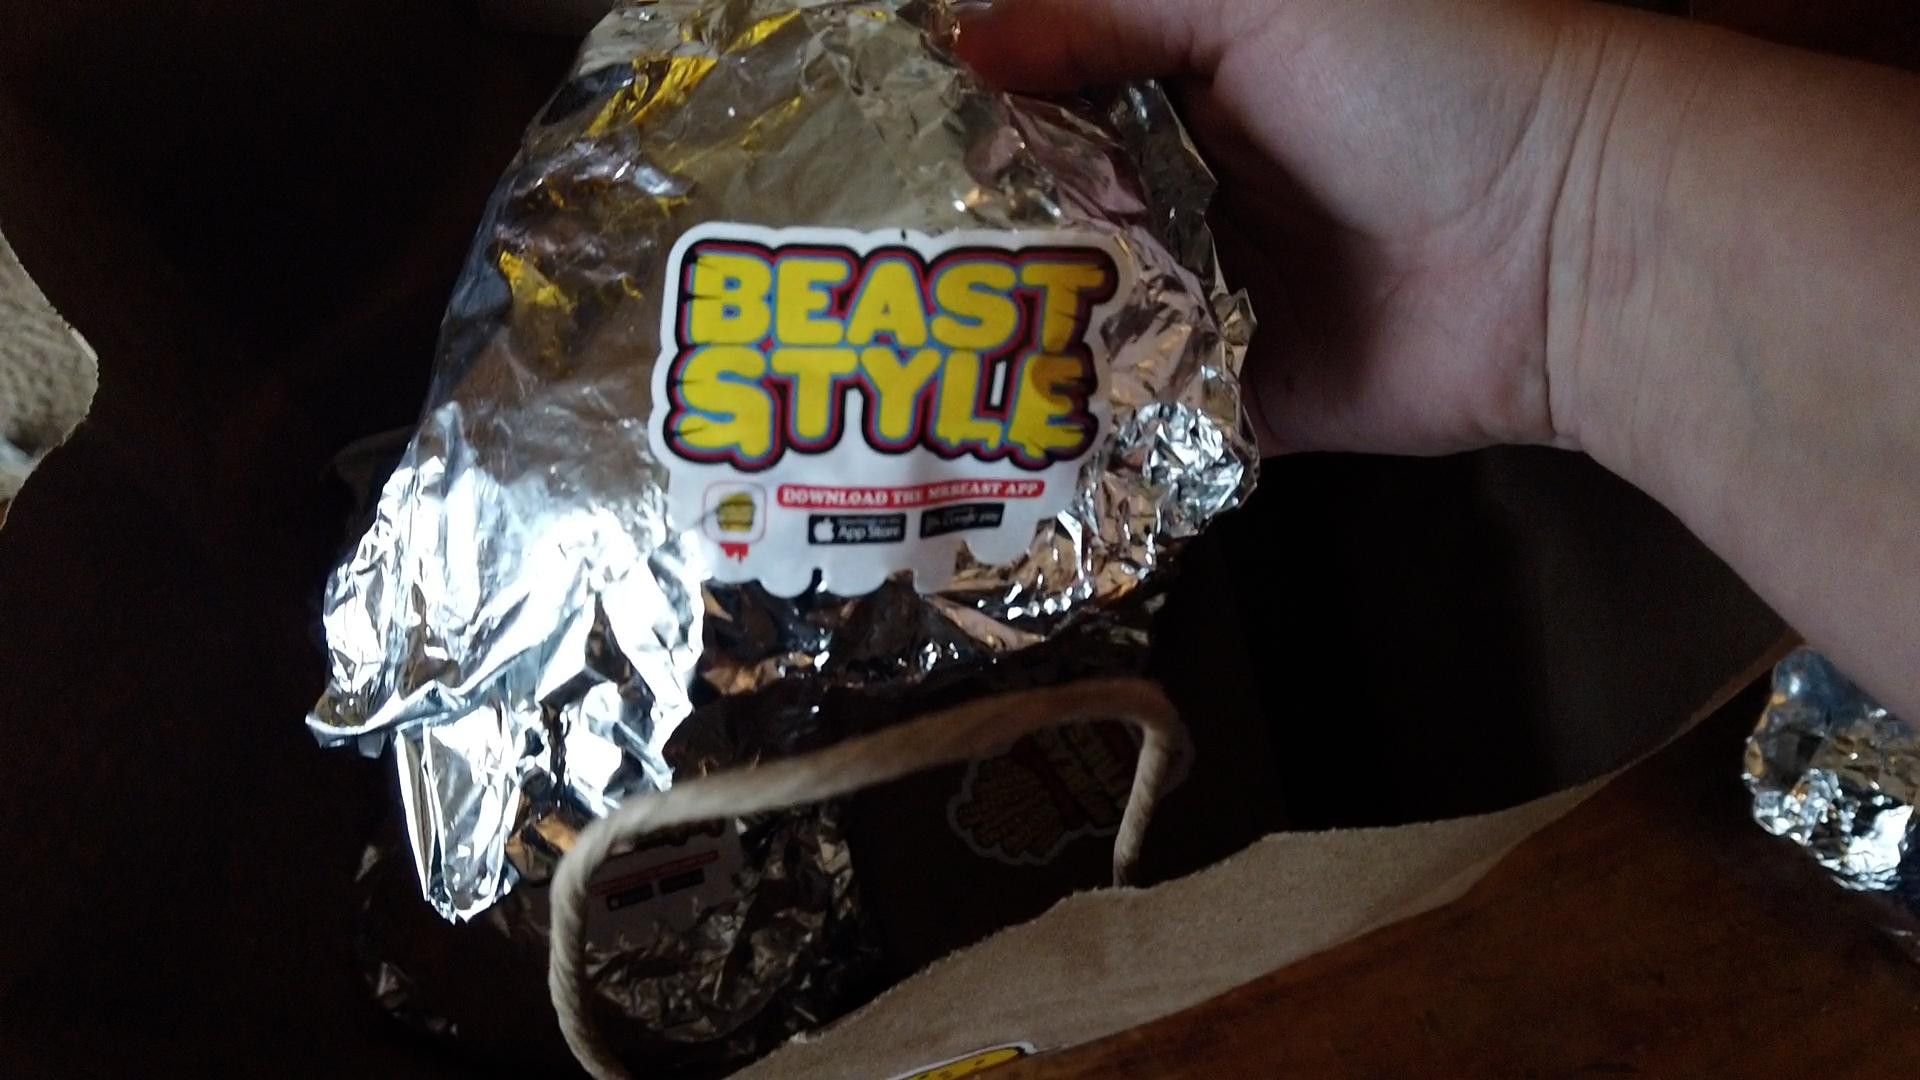 beast style burger